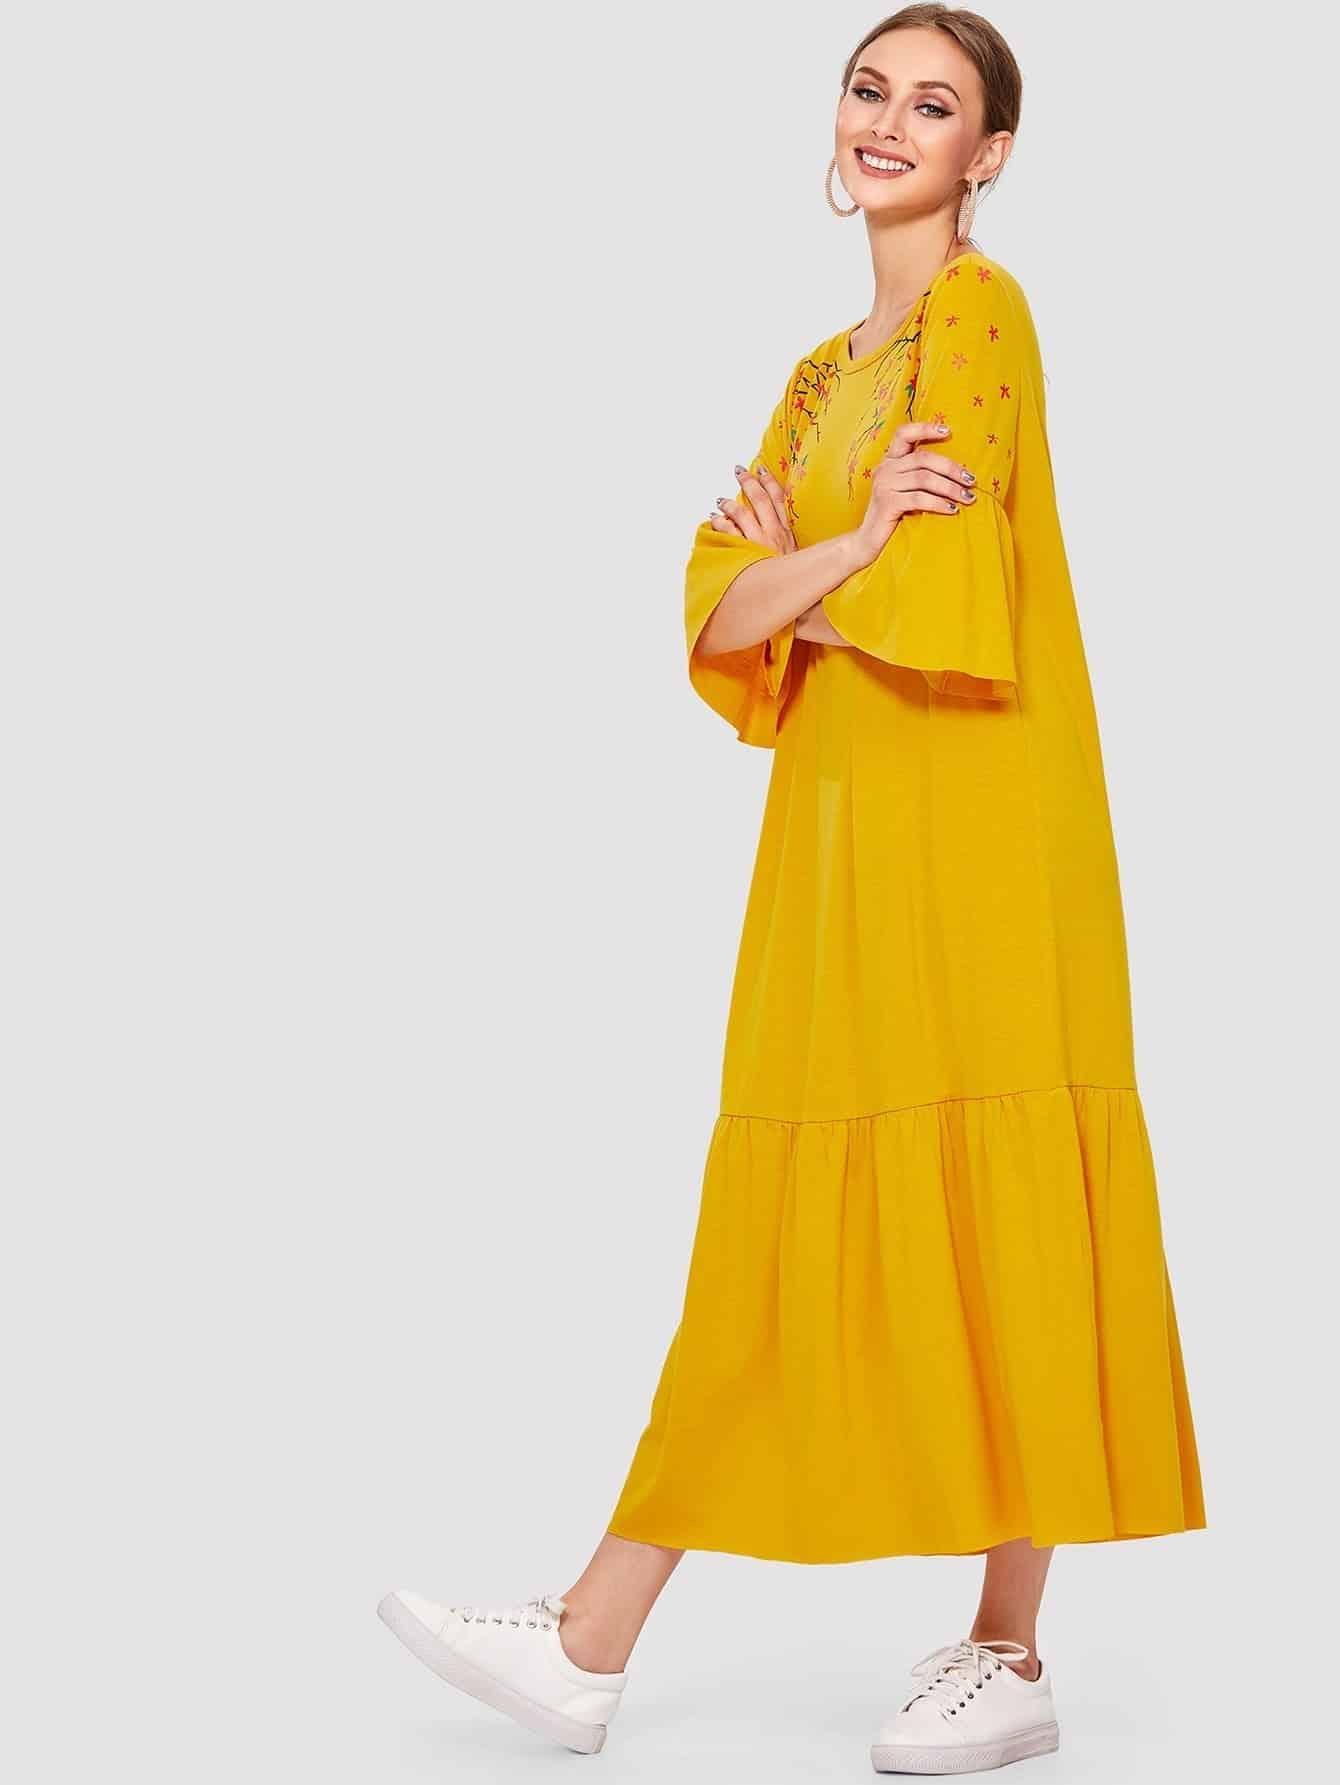 Flower Blossom Print Fluted Sleeve Tiered Hem Dress patchwork print tiered hem halter dress